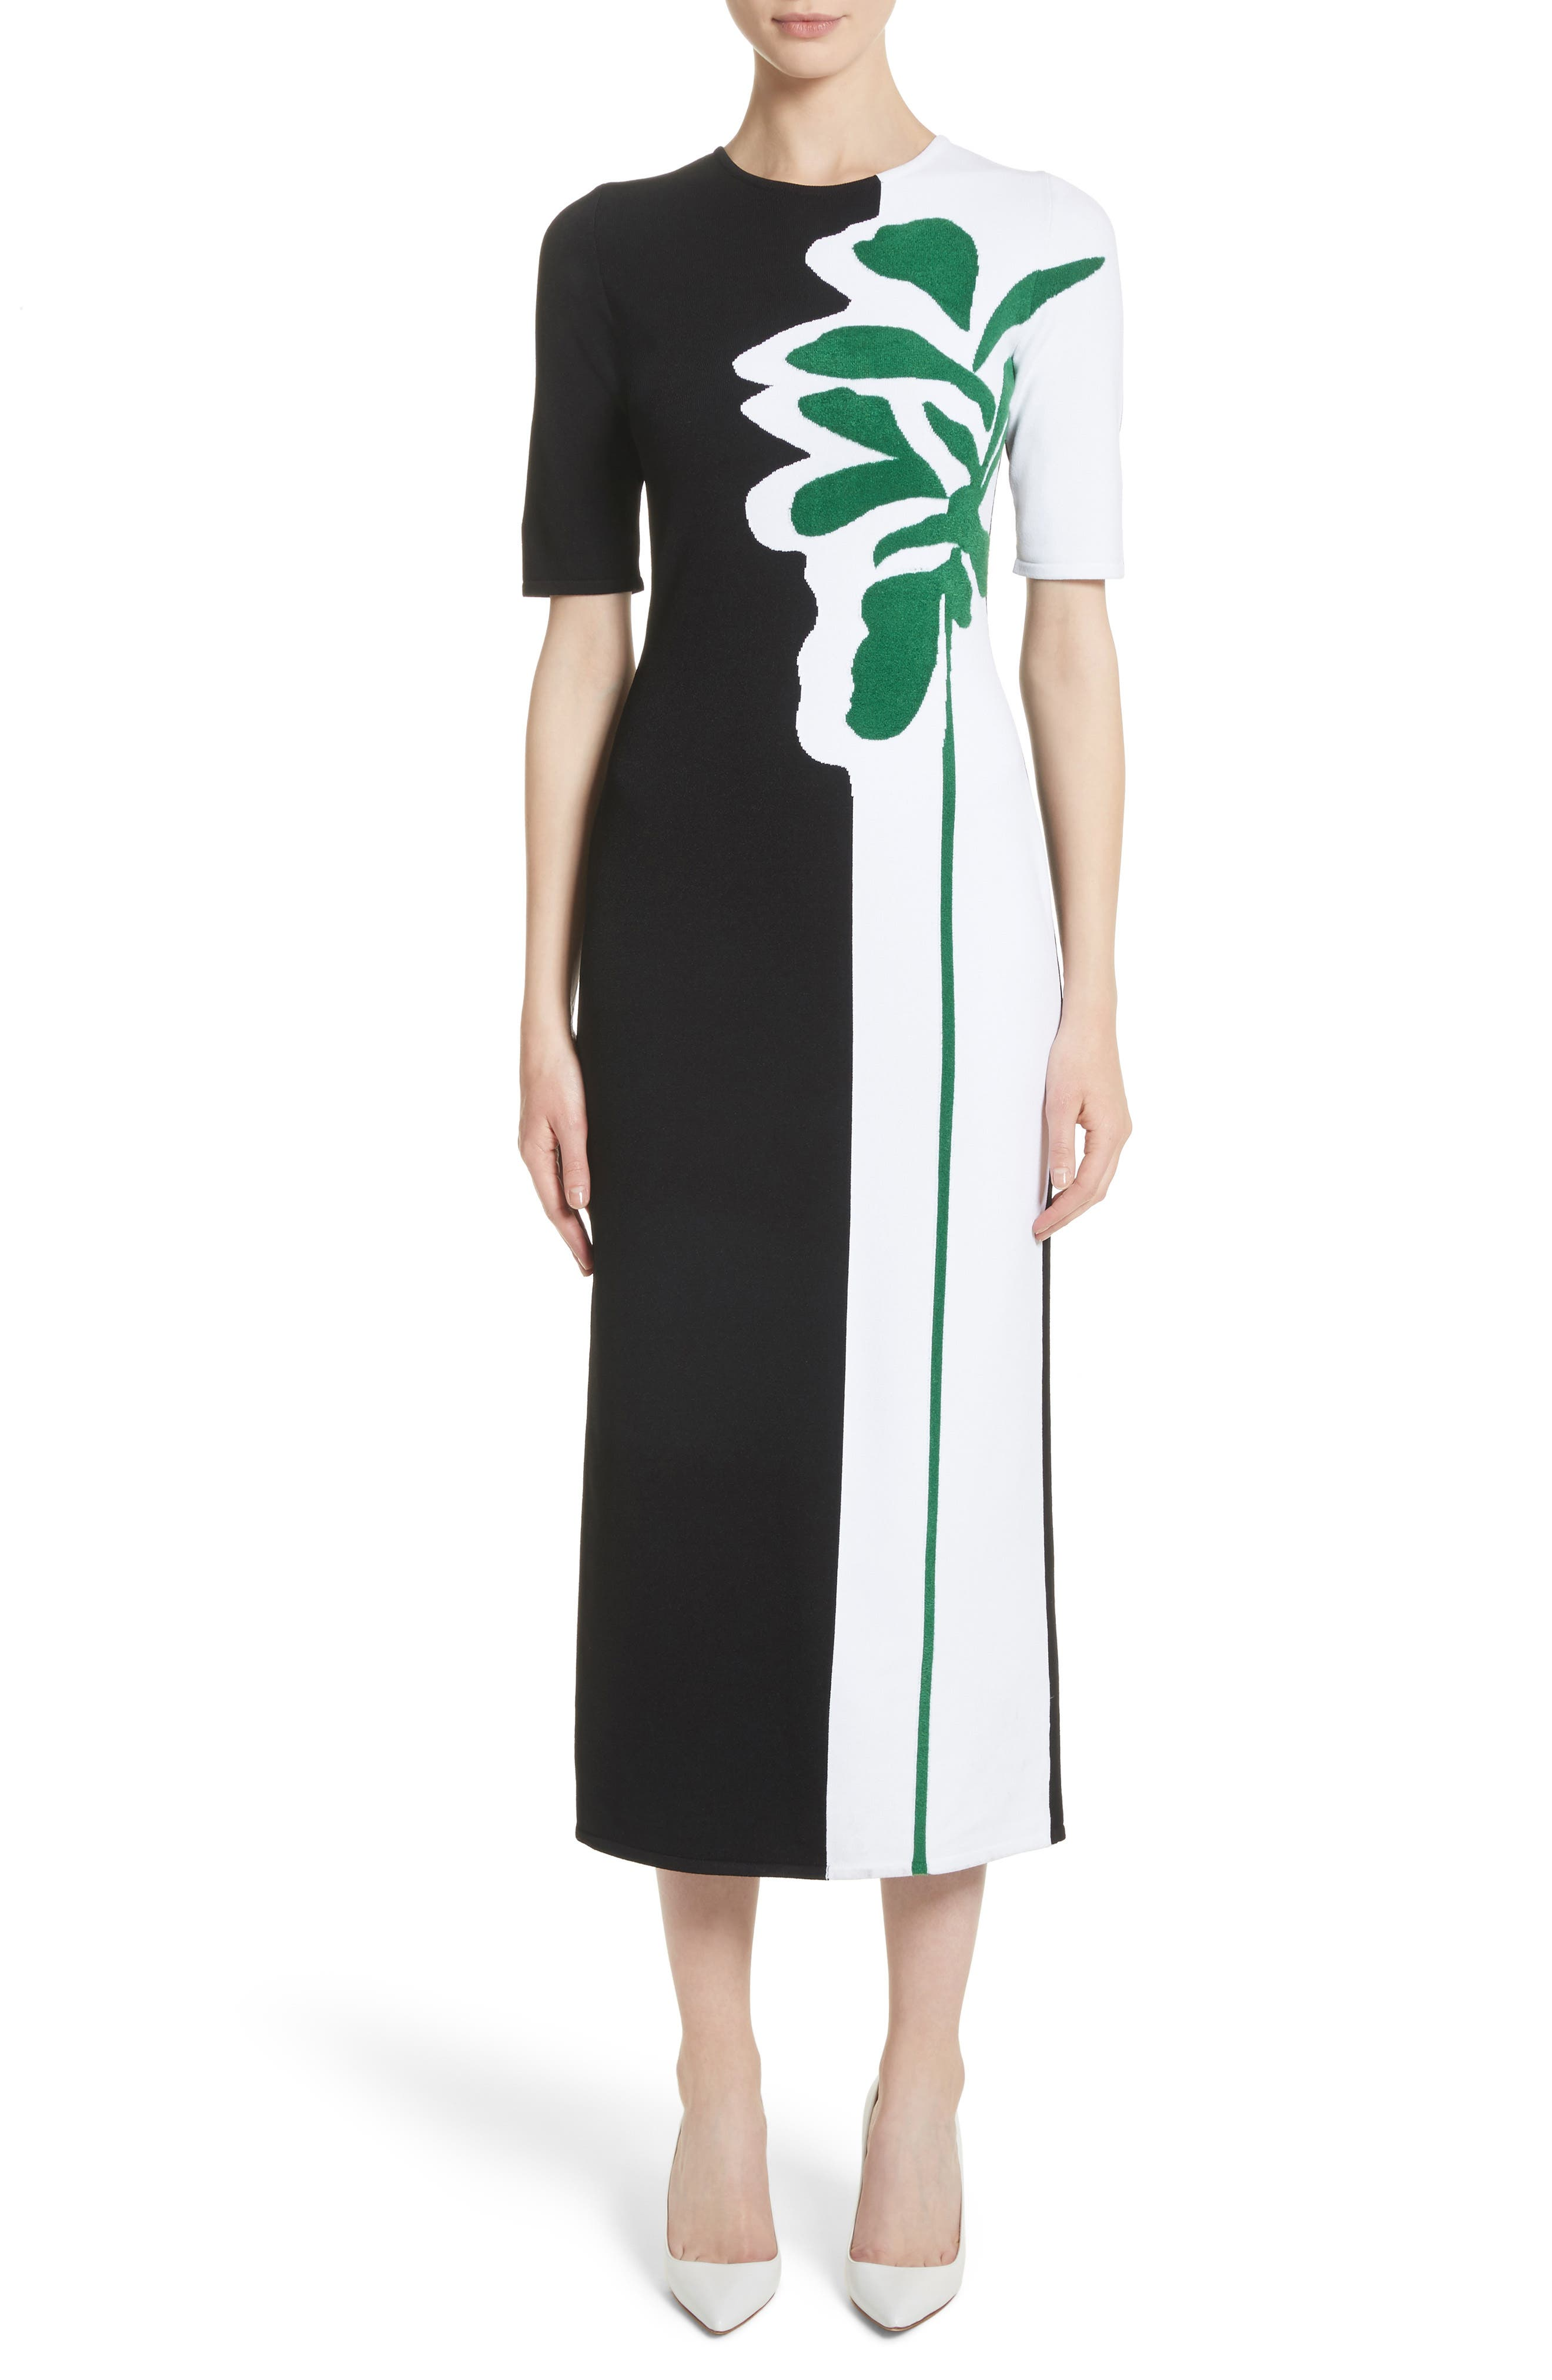 Intarsia Leaf Print Dress,                         Main,                         color, White/ Black/ Evergreen